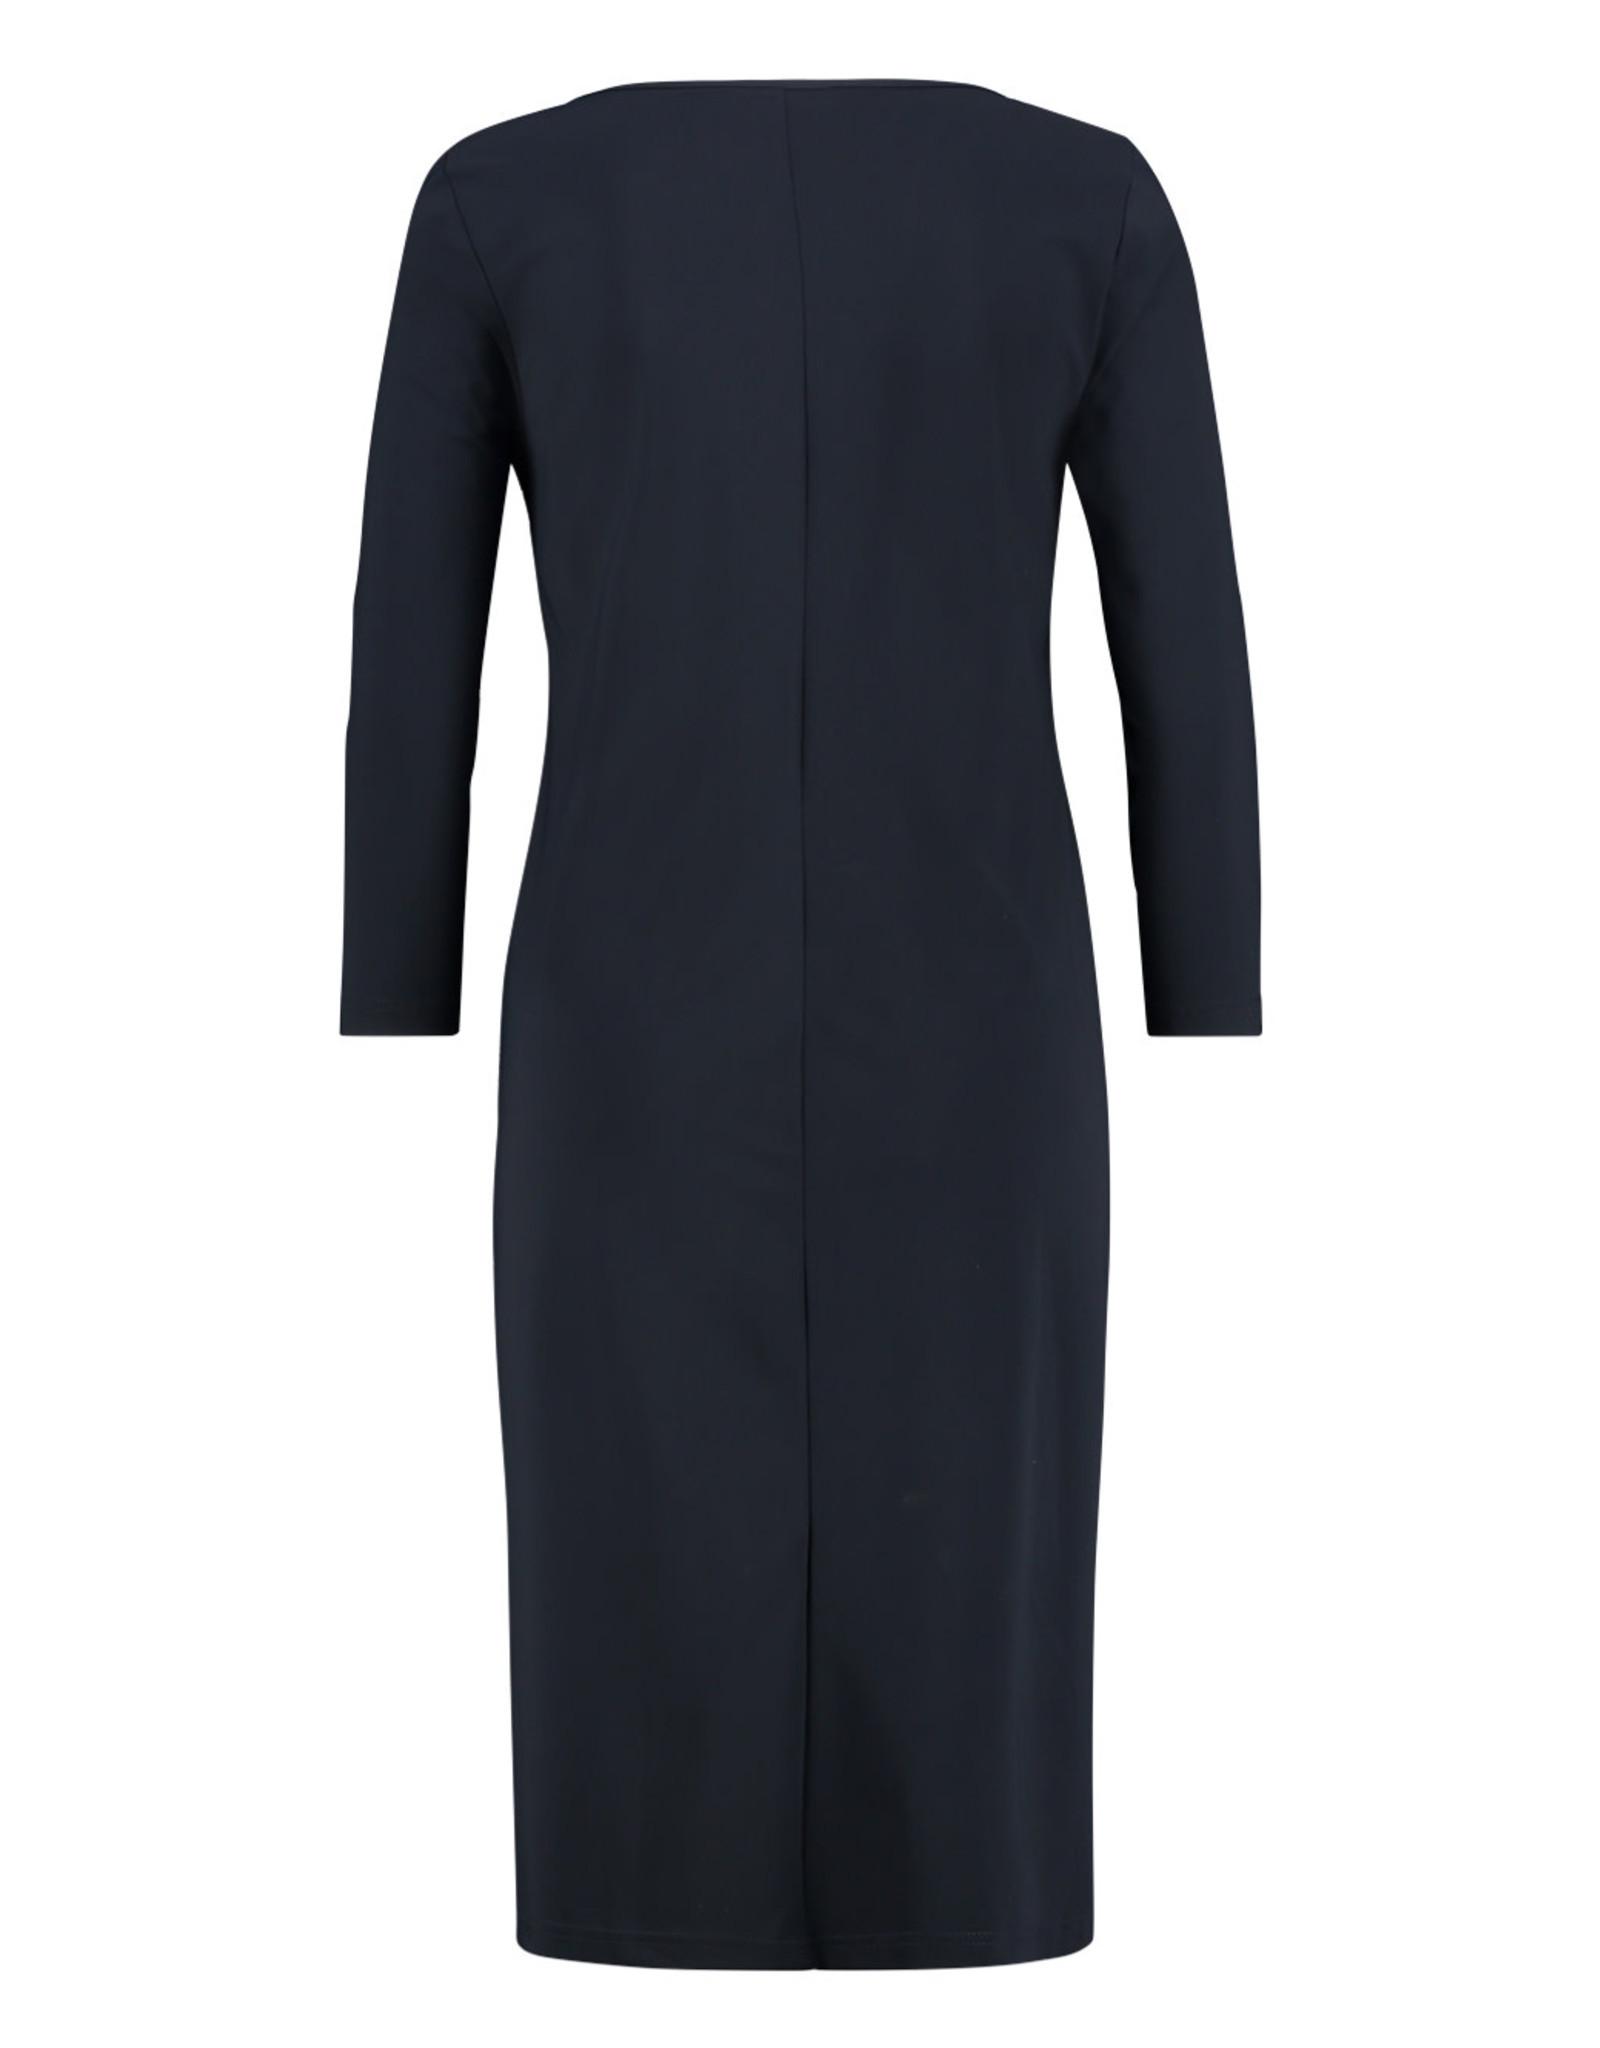 Studio Anneloes simplicity dress 91299